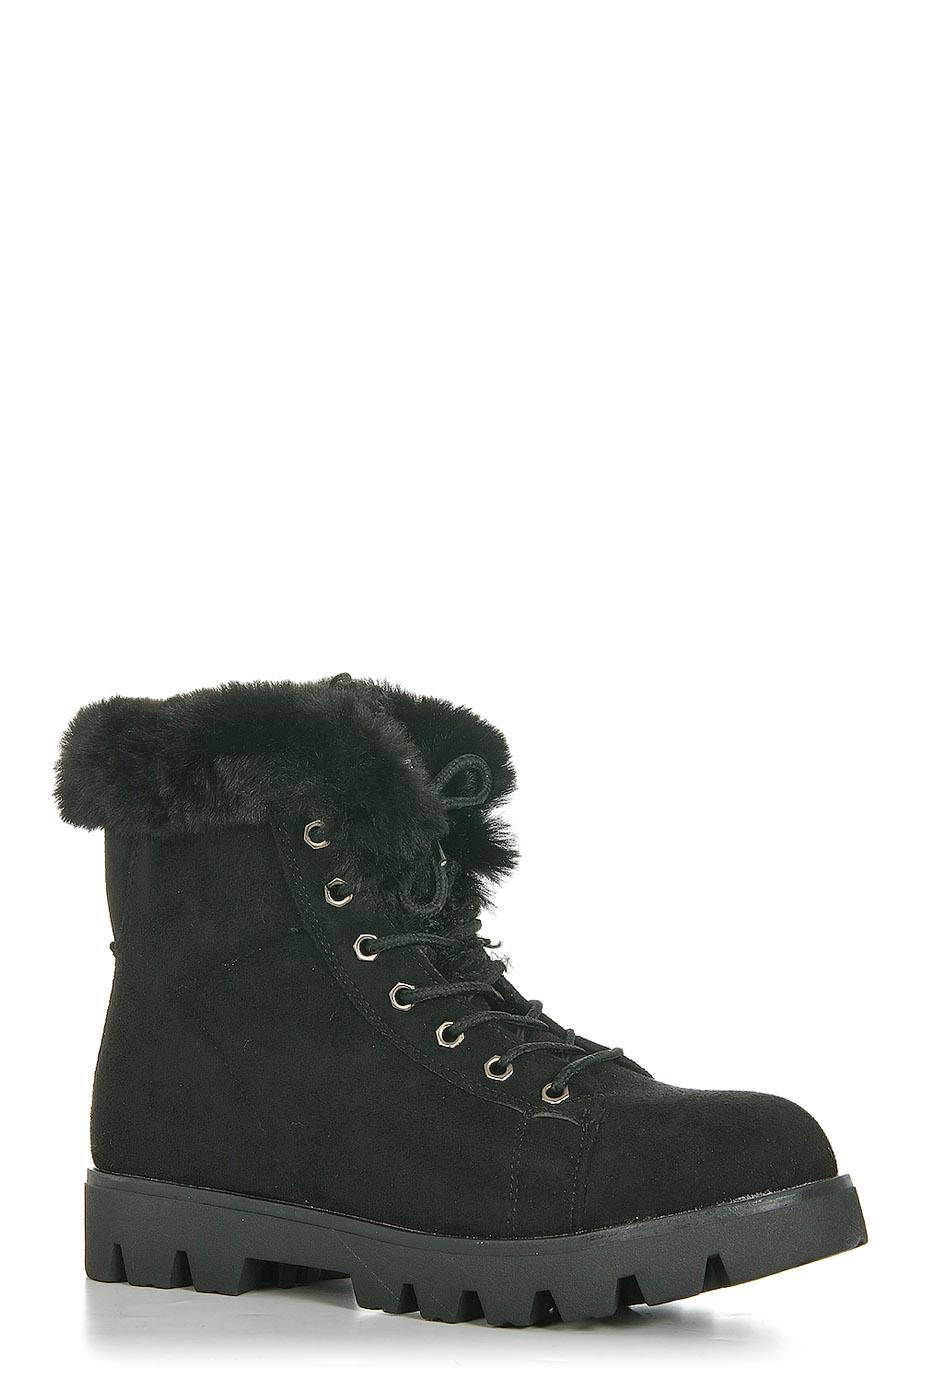 Ботинки TOPLAND2352-PB76151B/BLACK